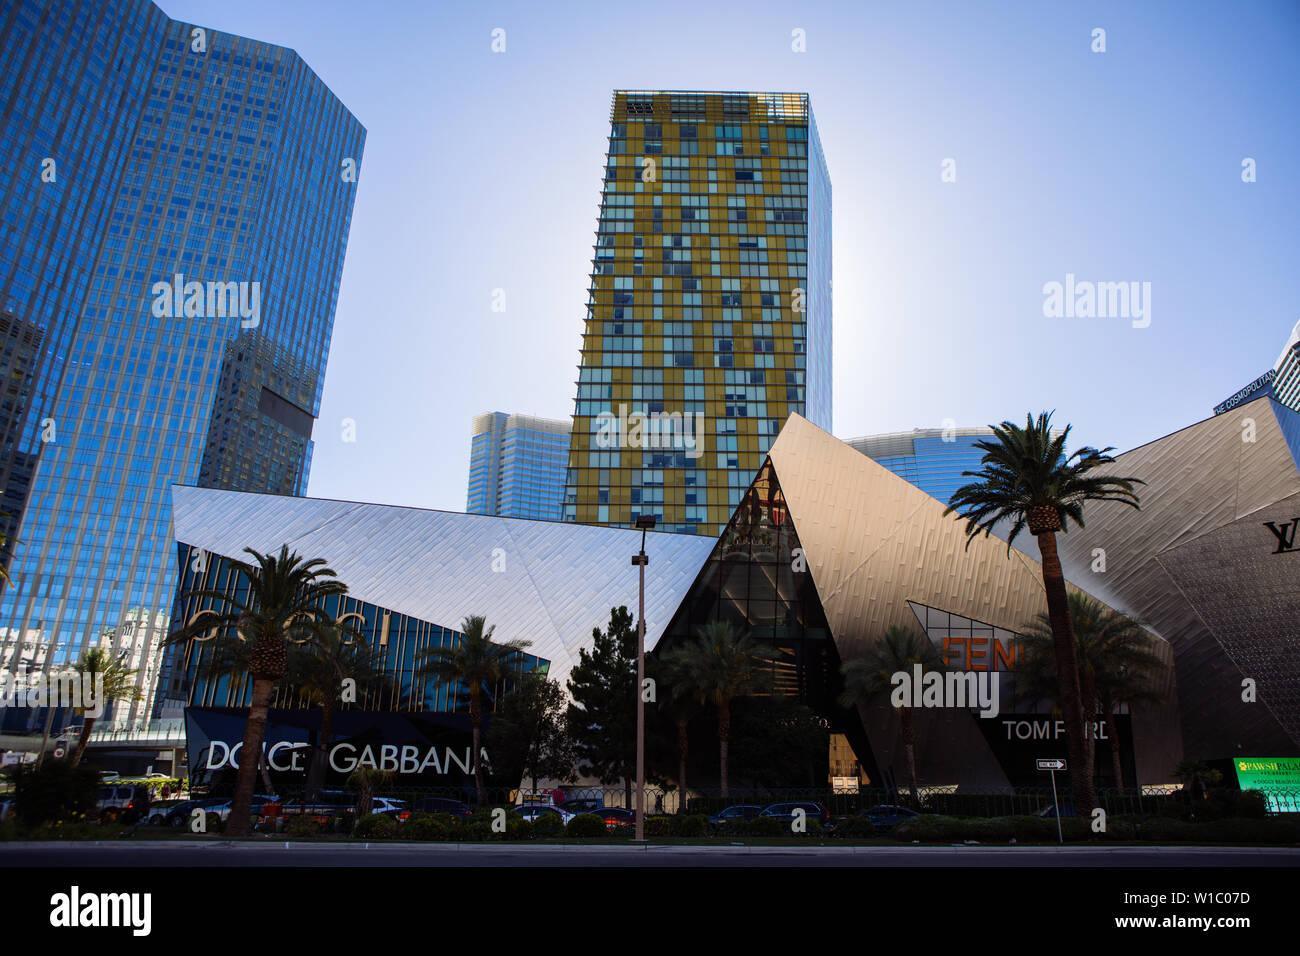 The Crystals, AKA Crystals at CityCenter and Crystals Retail District, Dolce & Gabbana, Fendi, etc, Las Vegas Blvd, The strip, Las Vegas, Nevada, USA - Stock Image